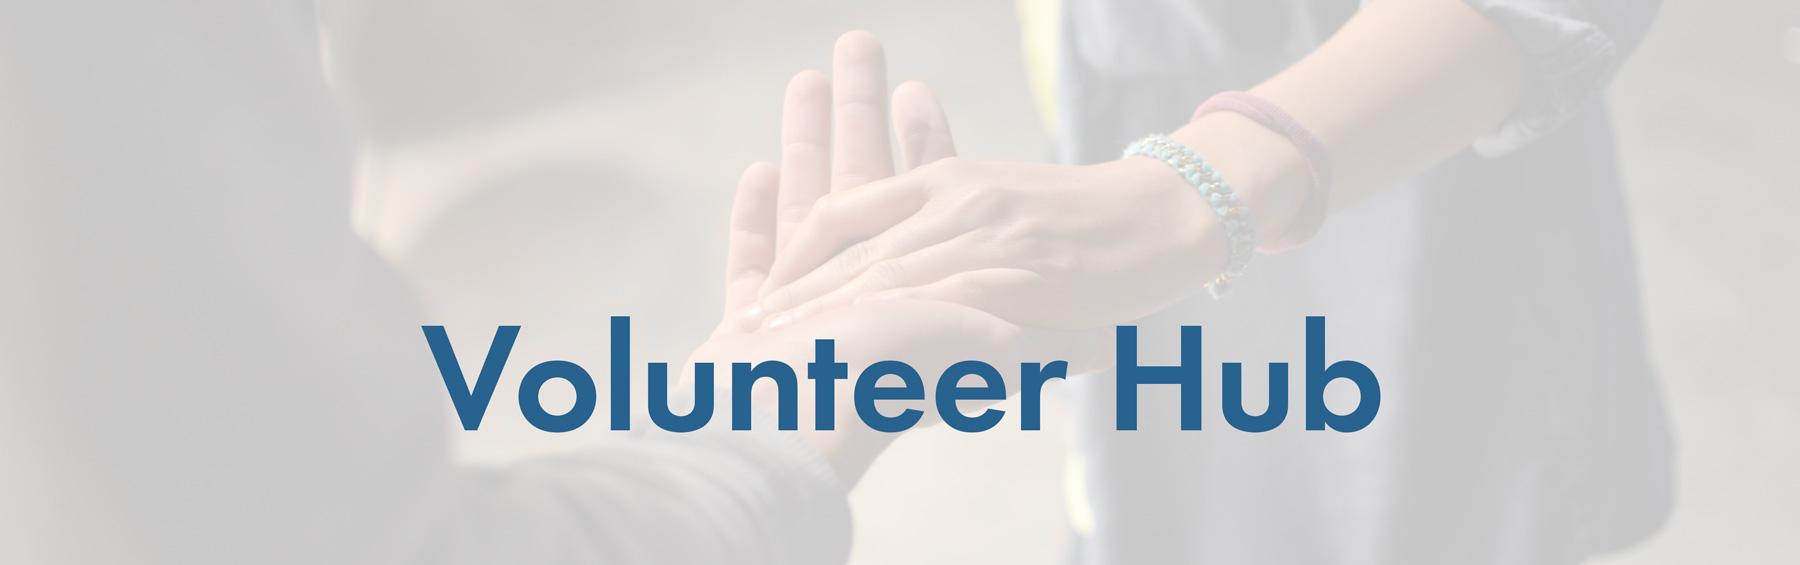 graphic: Volunteer Hub